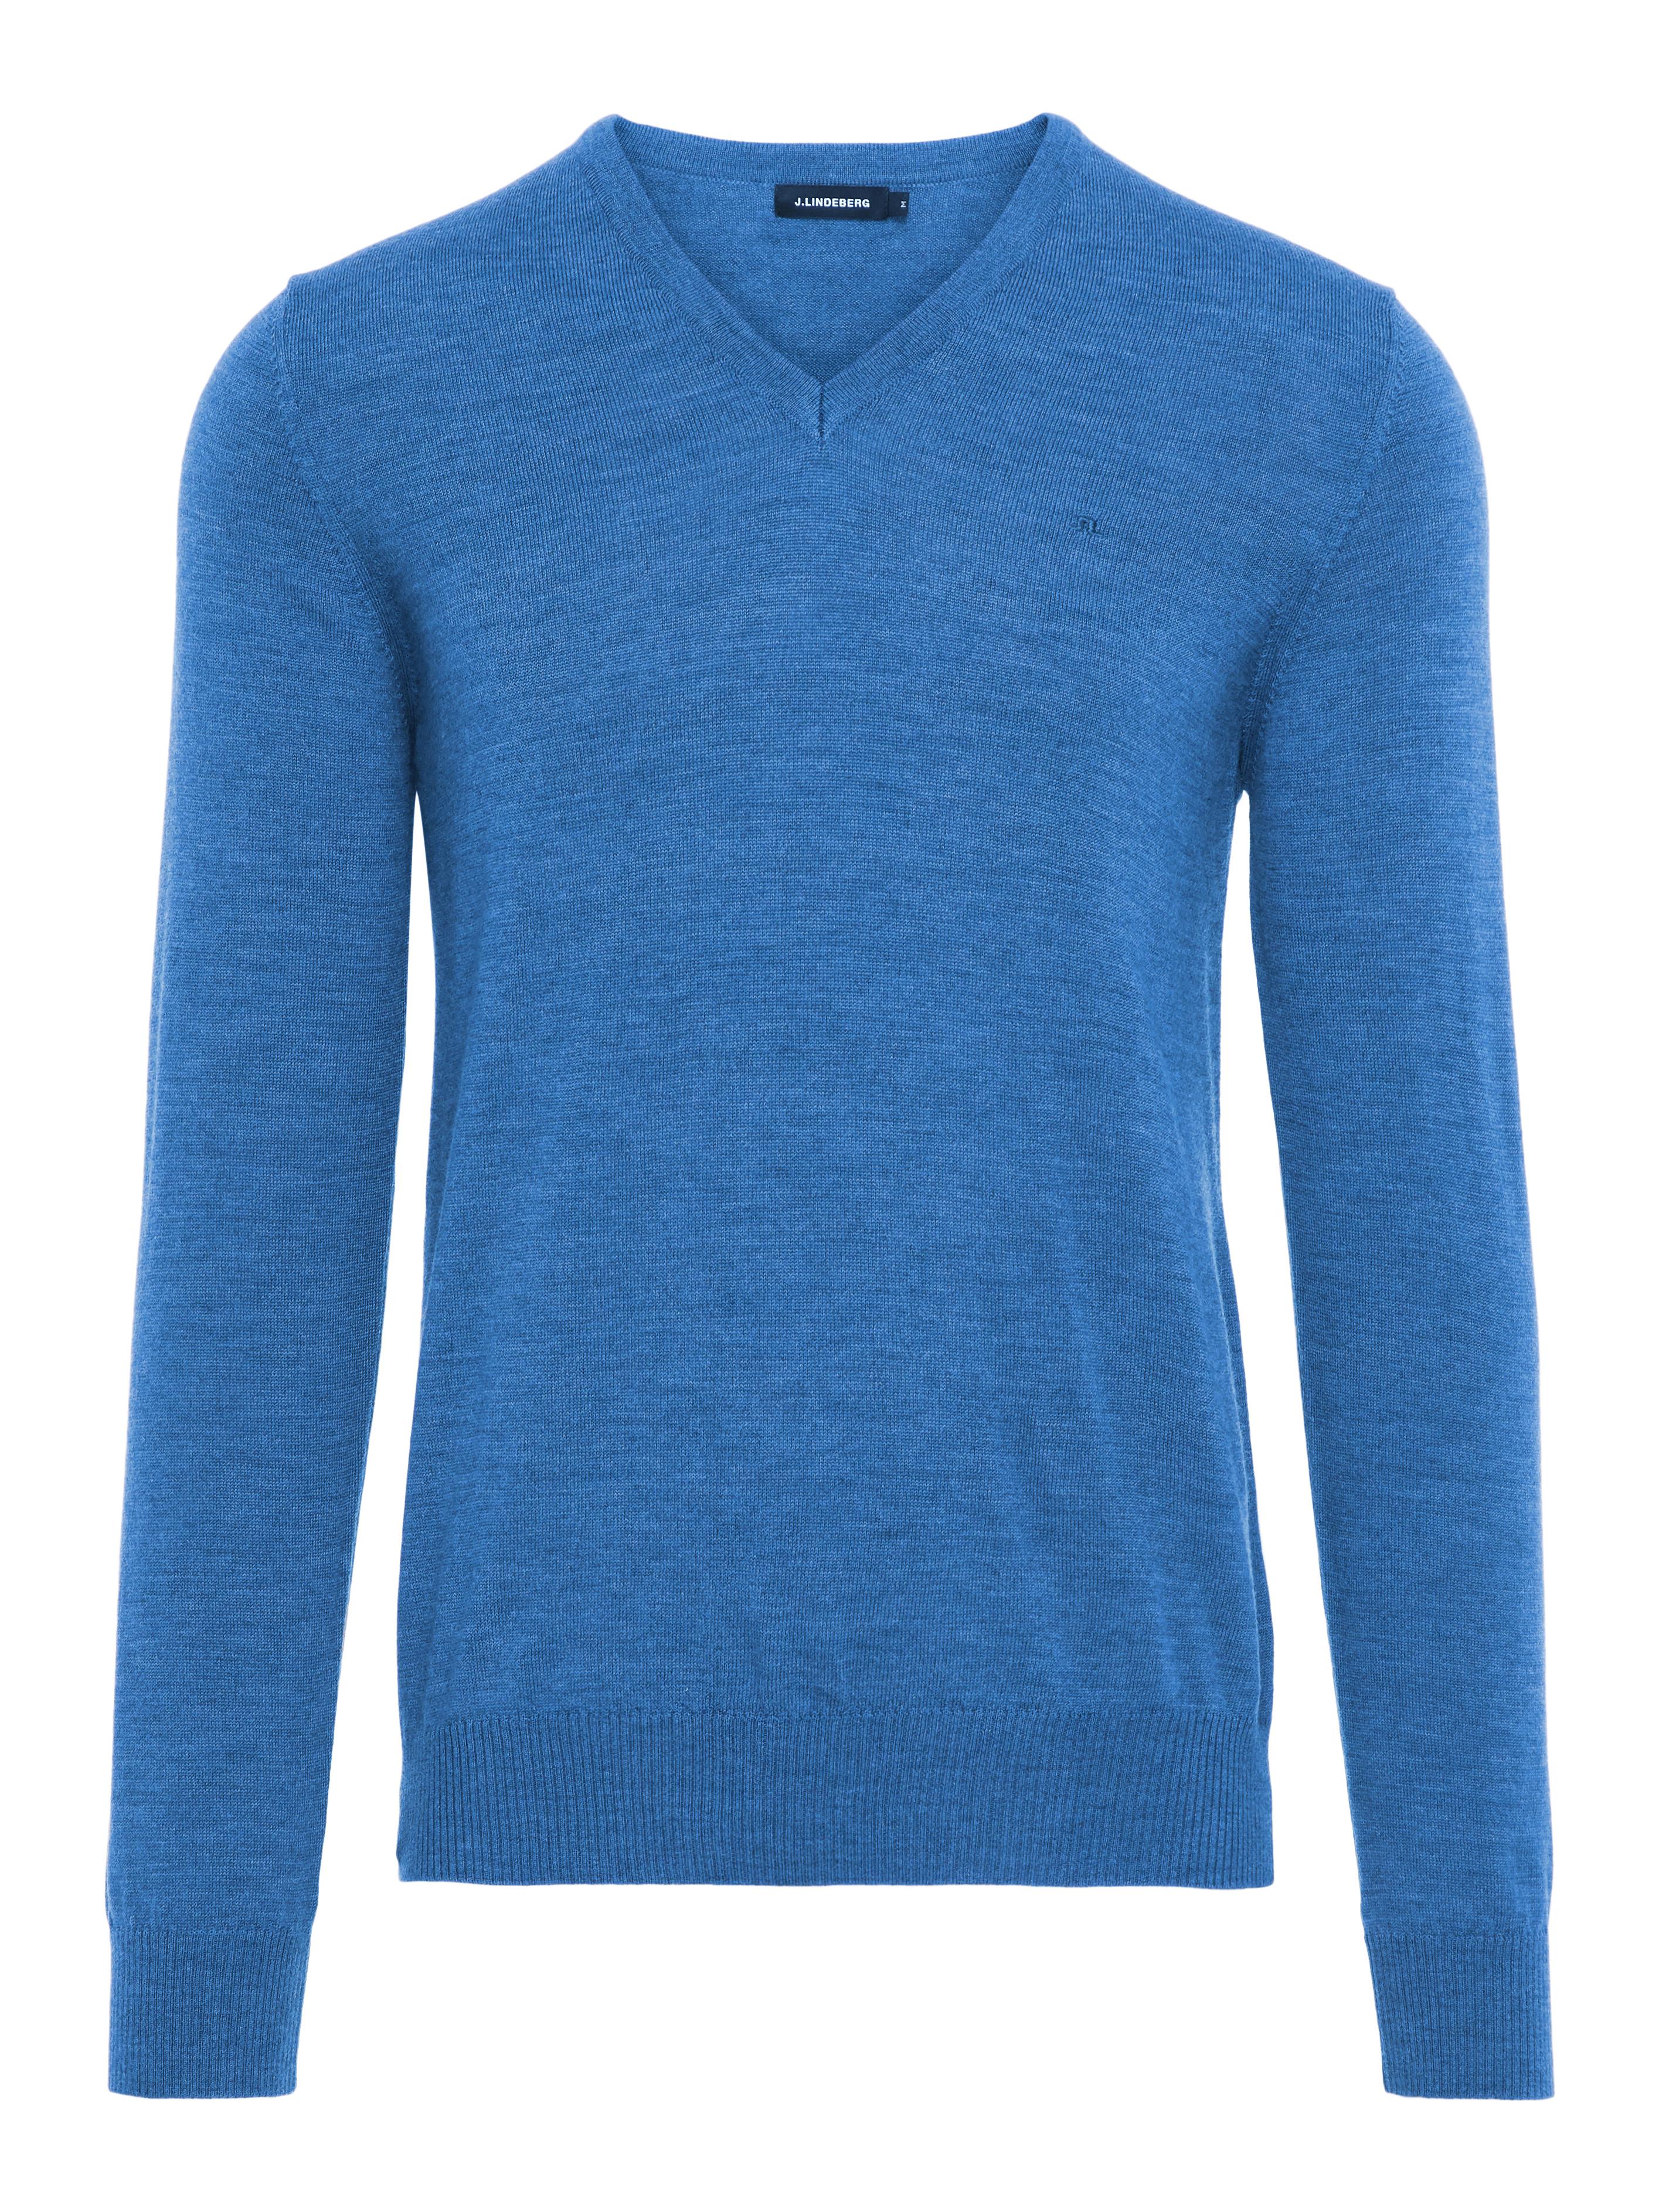 J Lindeberg Lymann True Merino Wool Sweatshirt Size Medium Herrenmode Kleidung & Accessoires